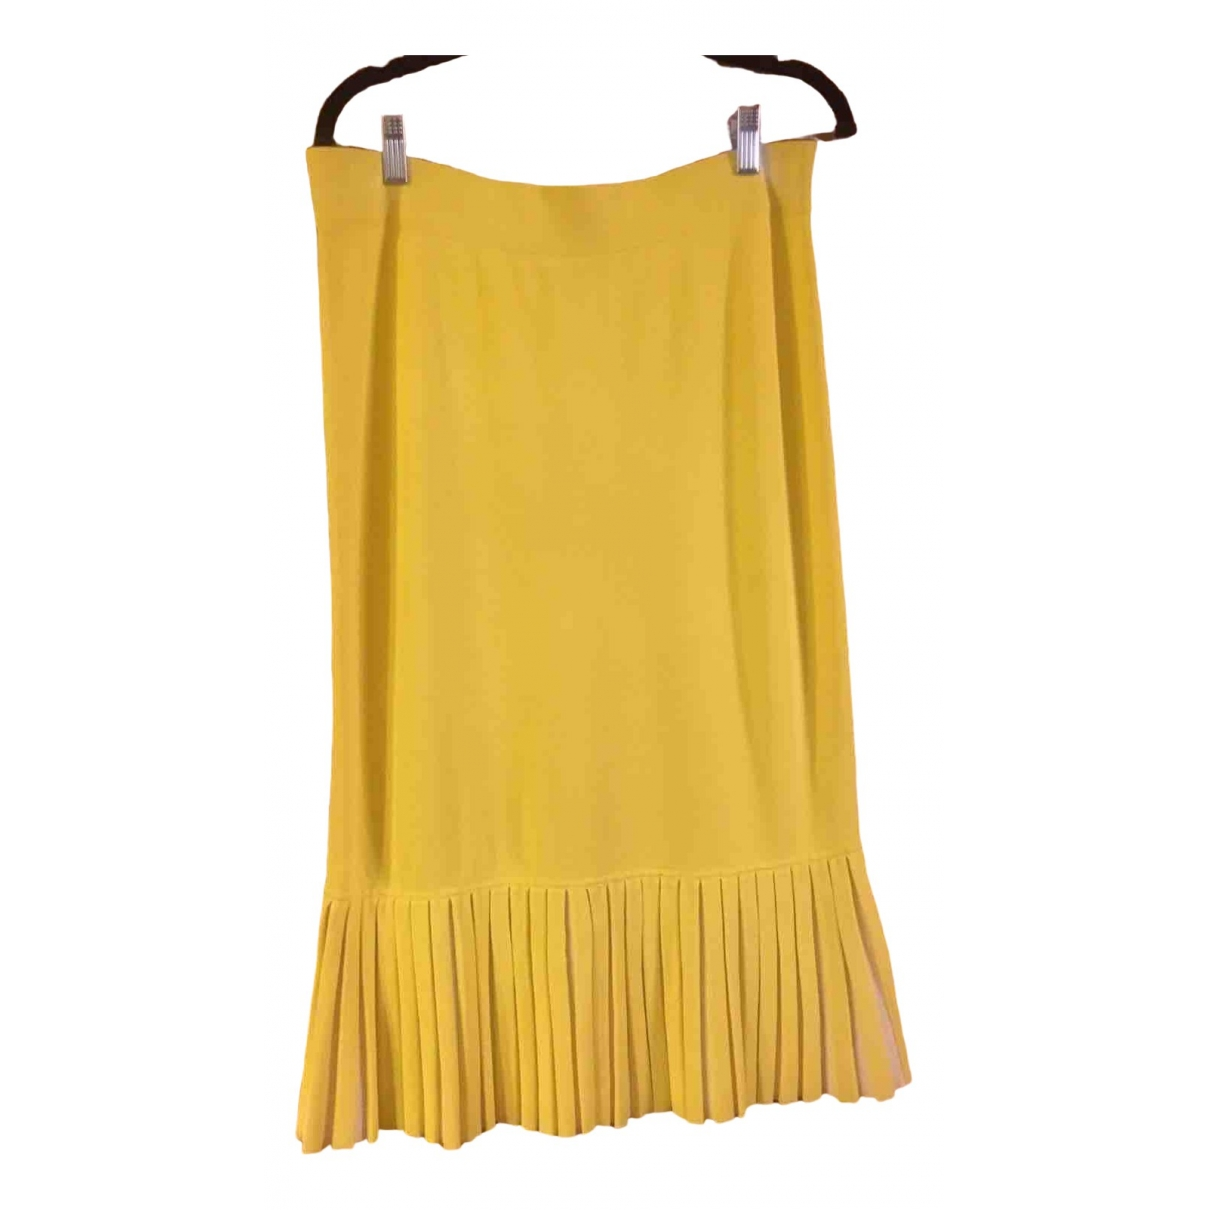 Cos \N Yellow Cotton skirt for Women M International